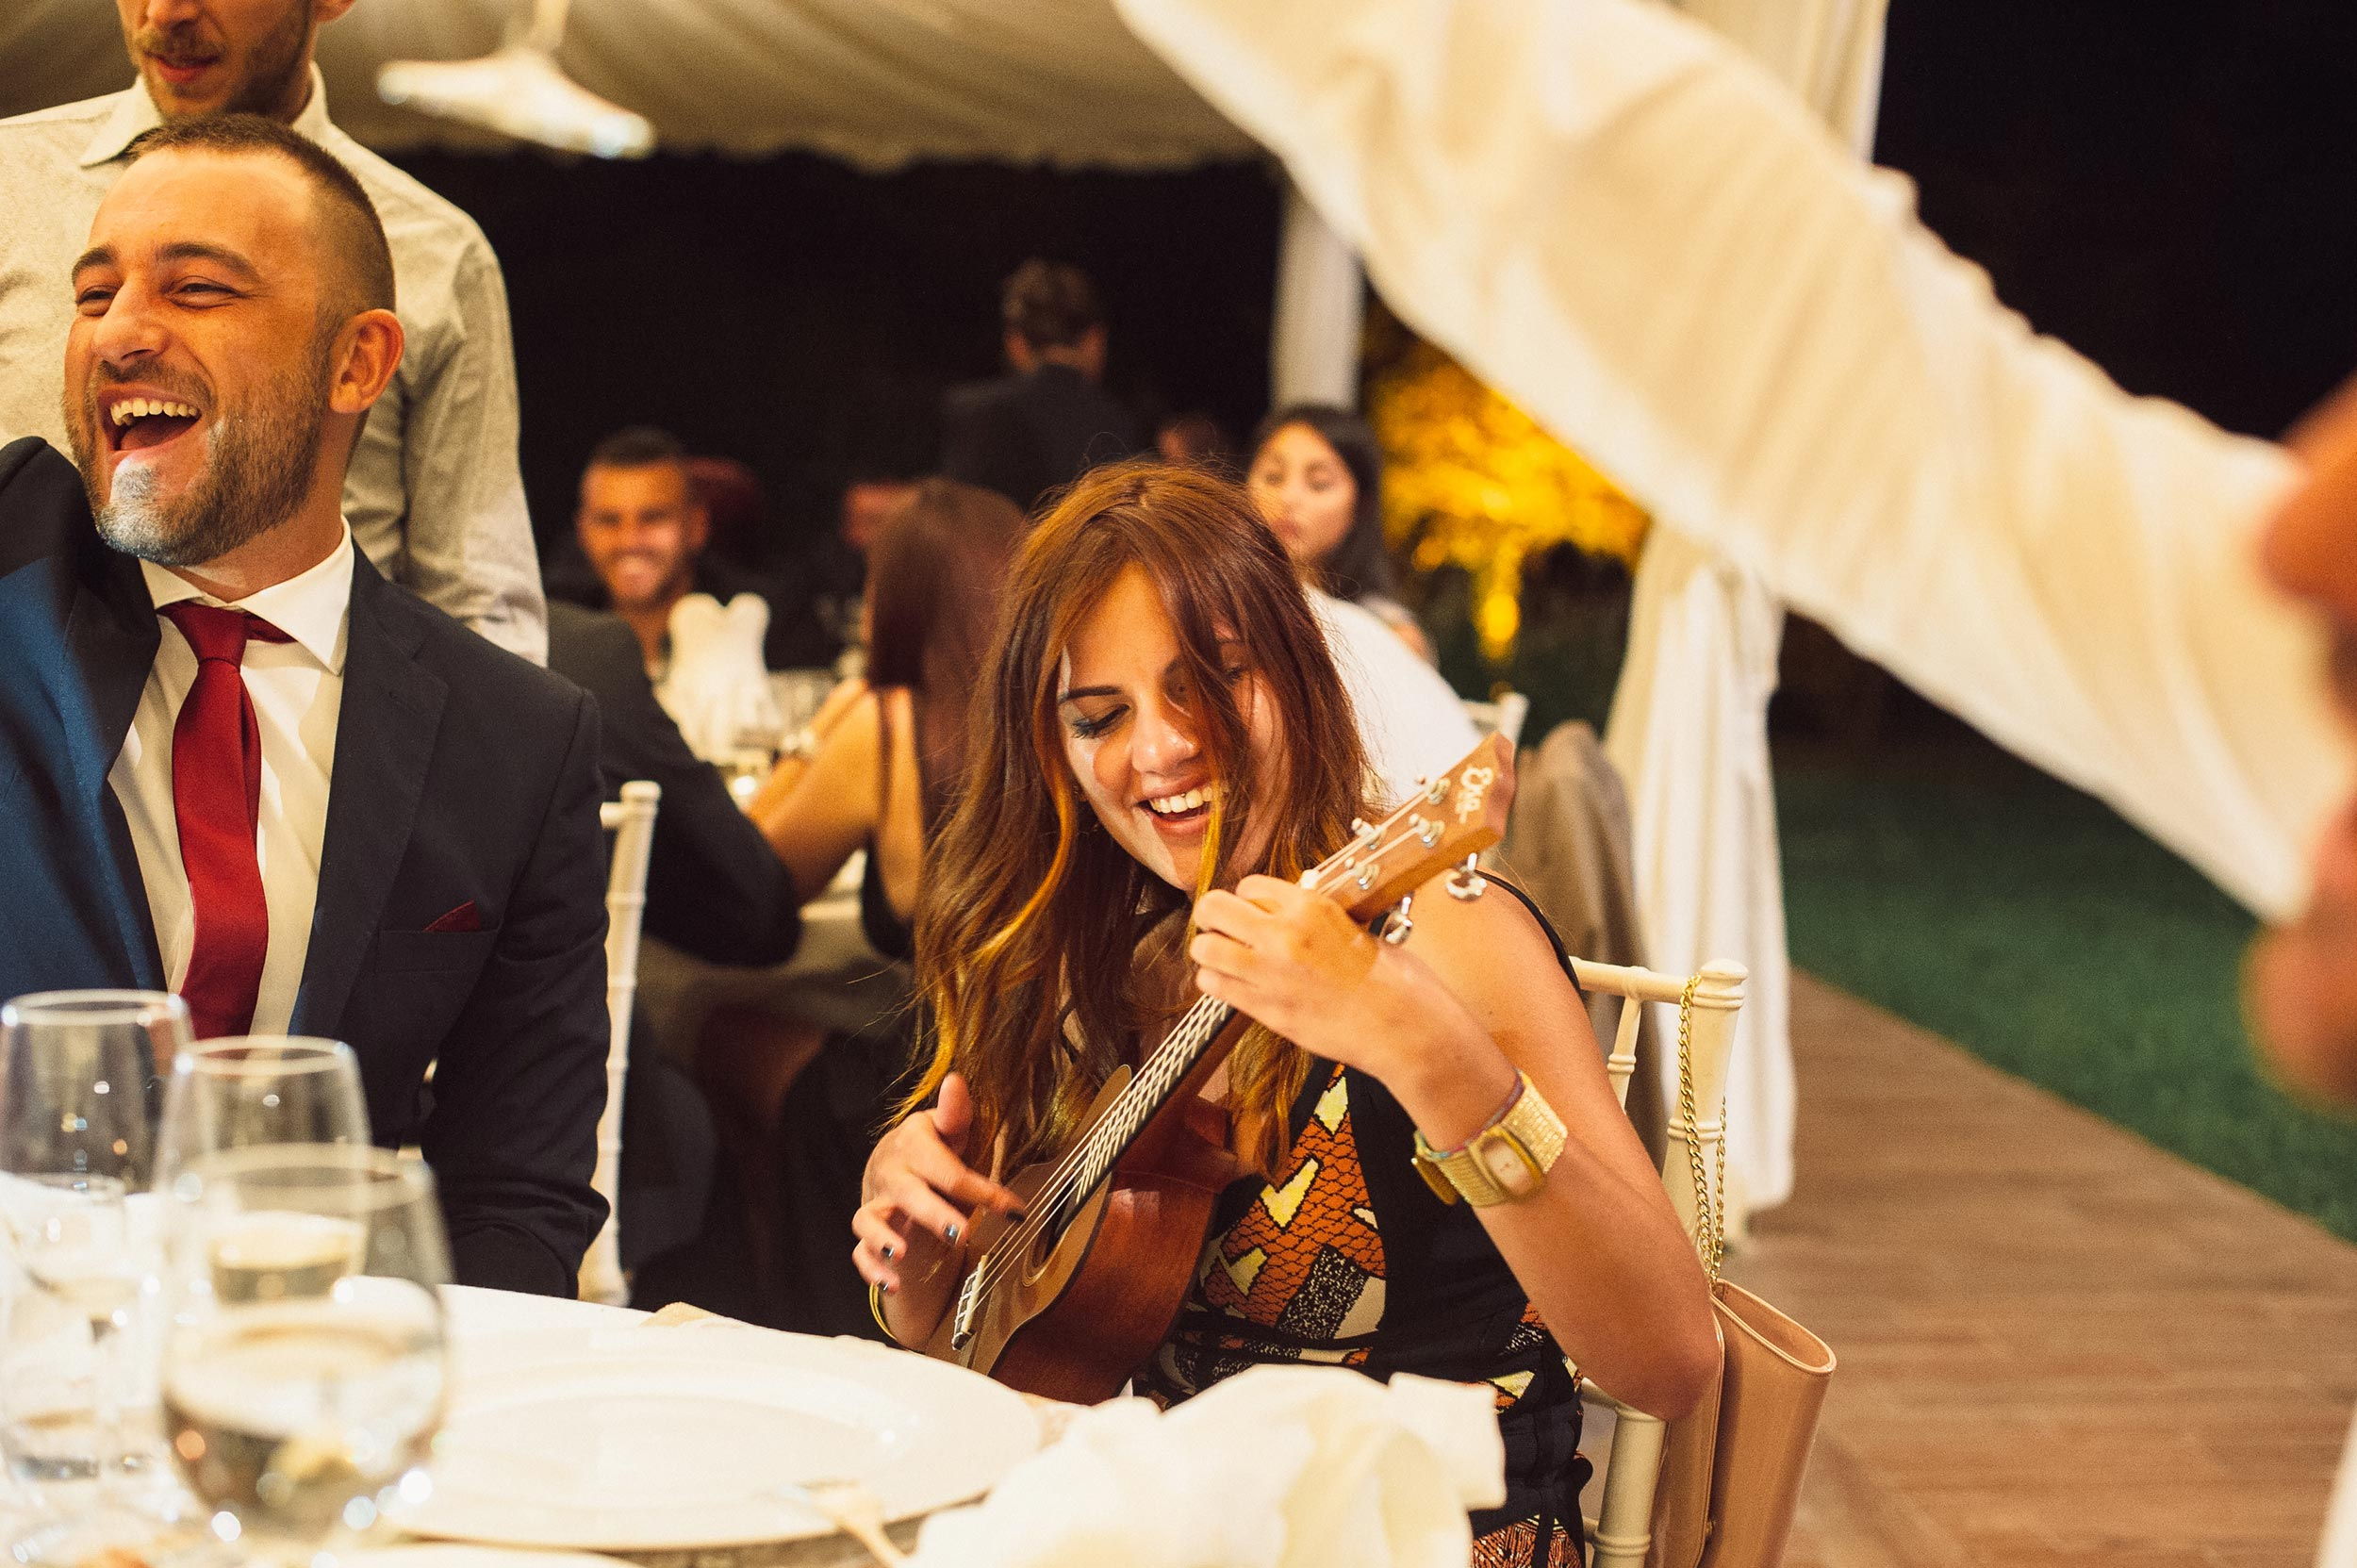 2016-Claudio-Teresa-Naples-Wedding-Photographer-Italy-Alessandro-Avenali-121.jpg